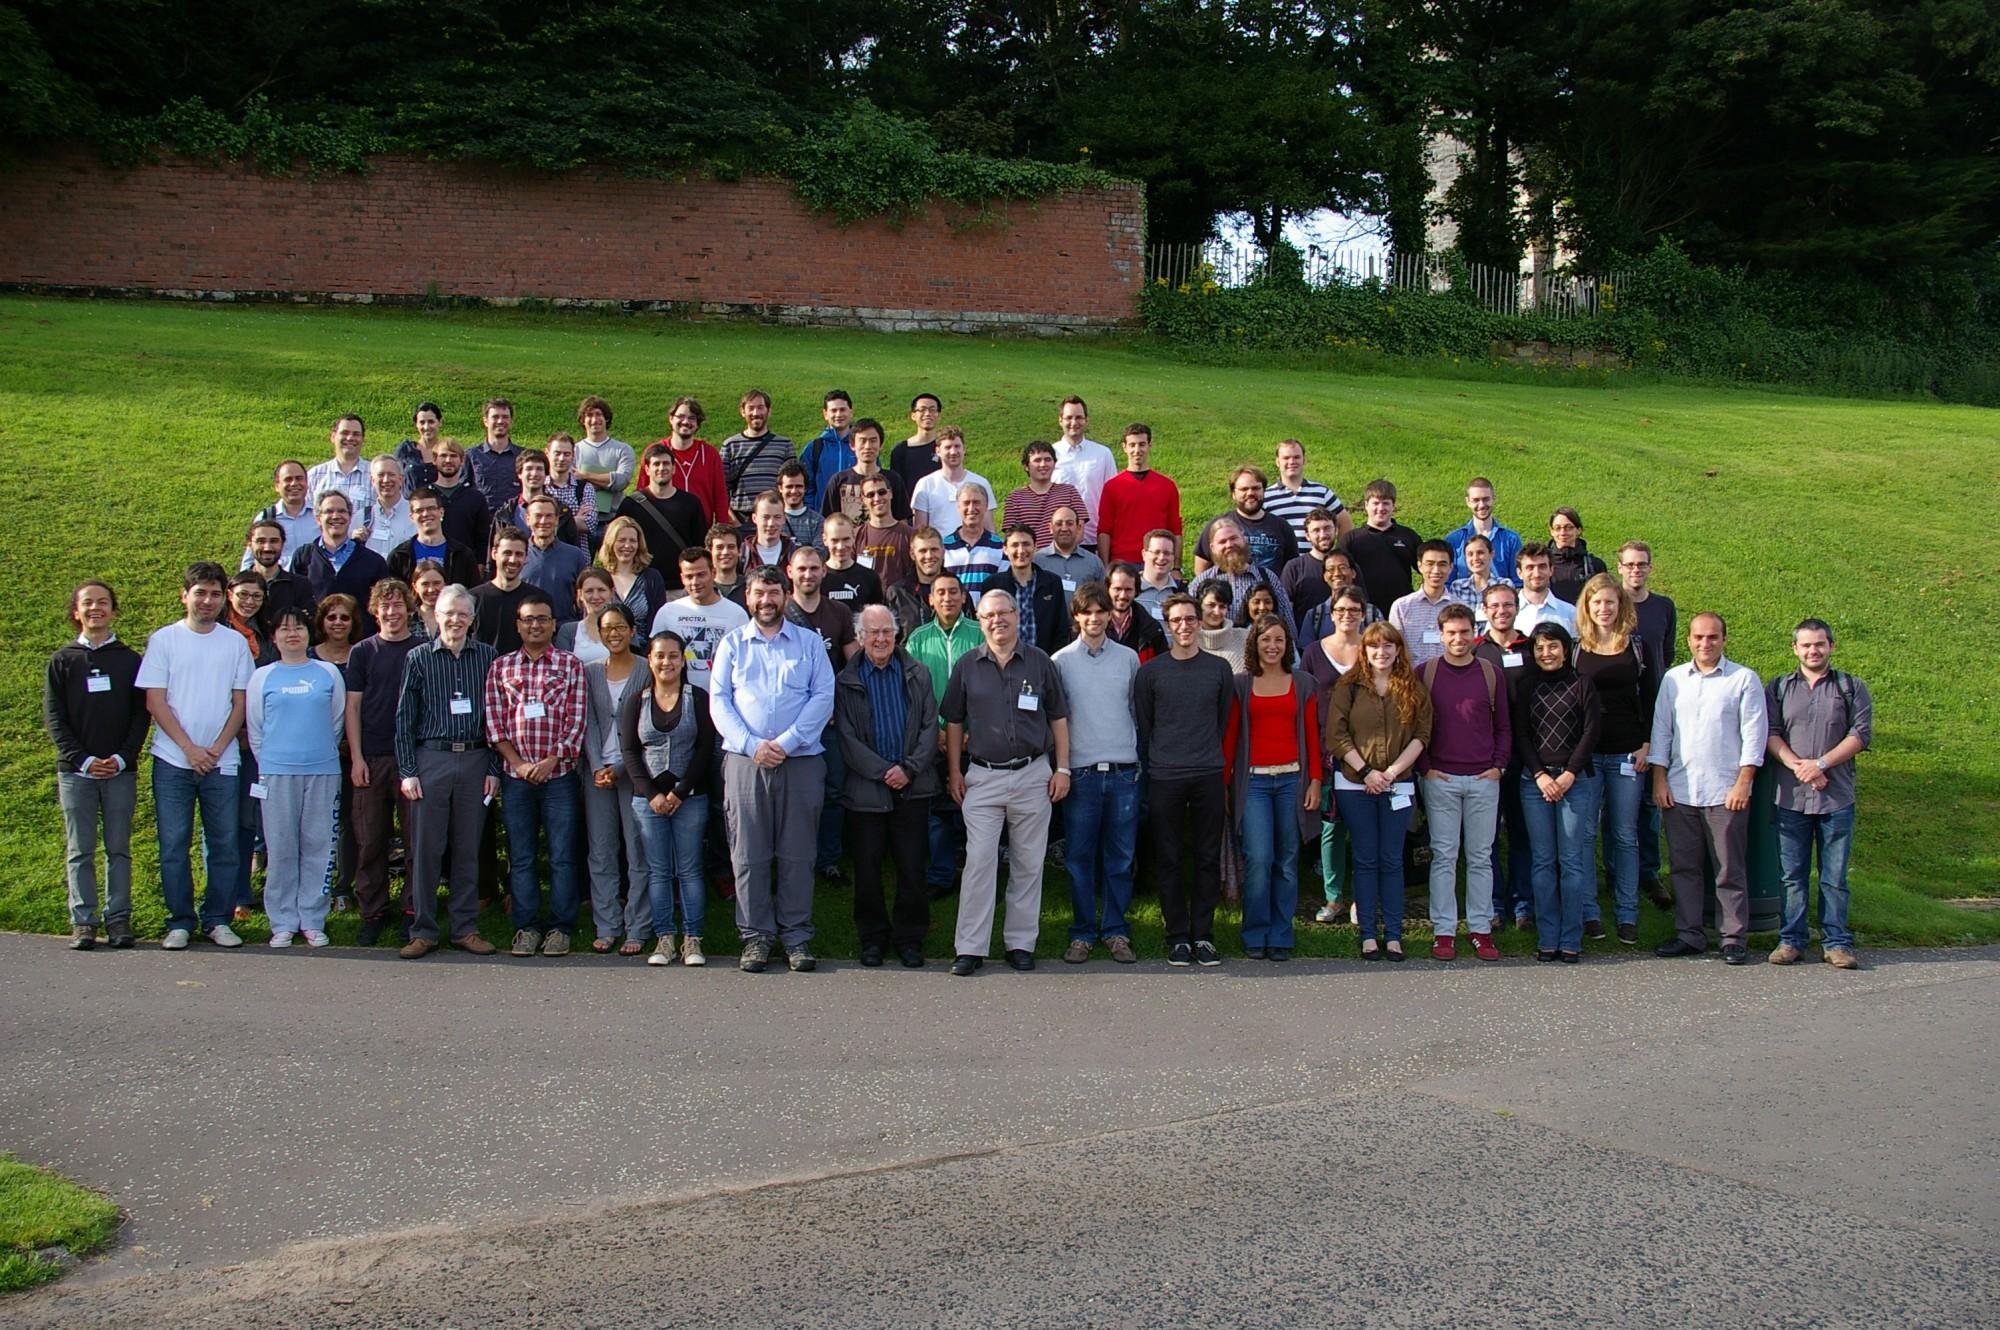 SUSSP69 Group Photograph No. 2 Copyright Alan Walker, University of Edinburgh.